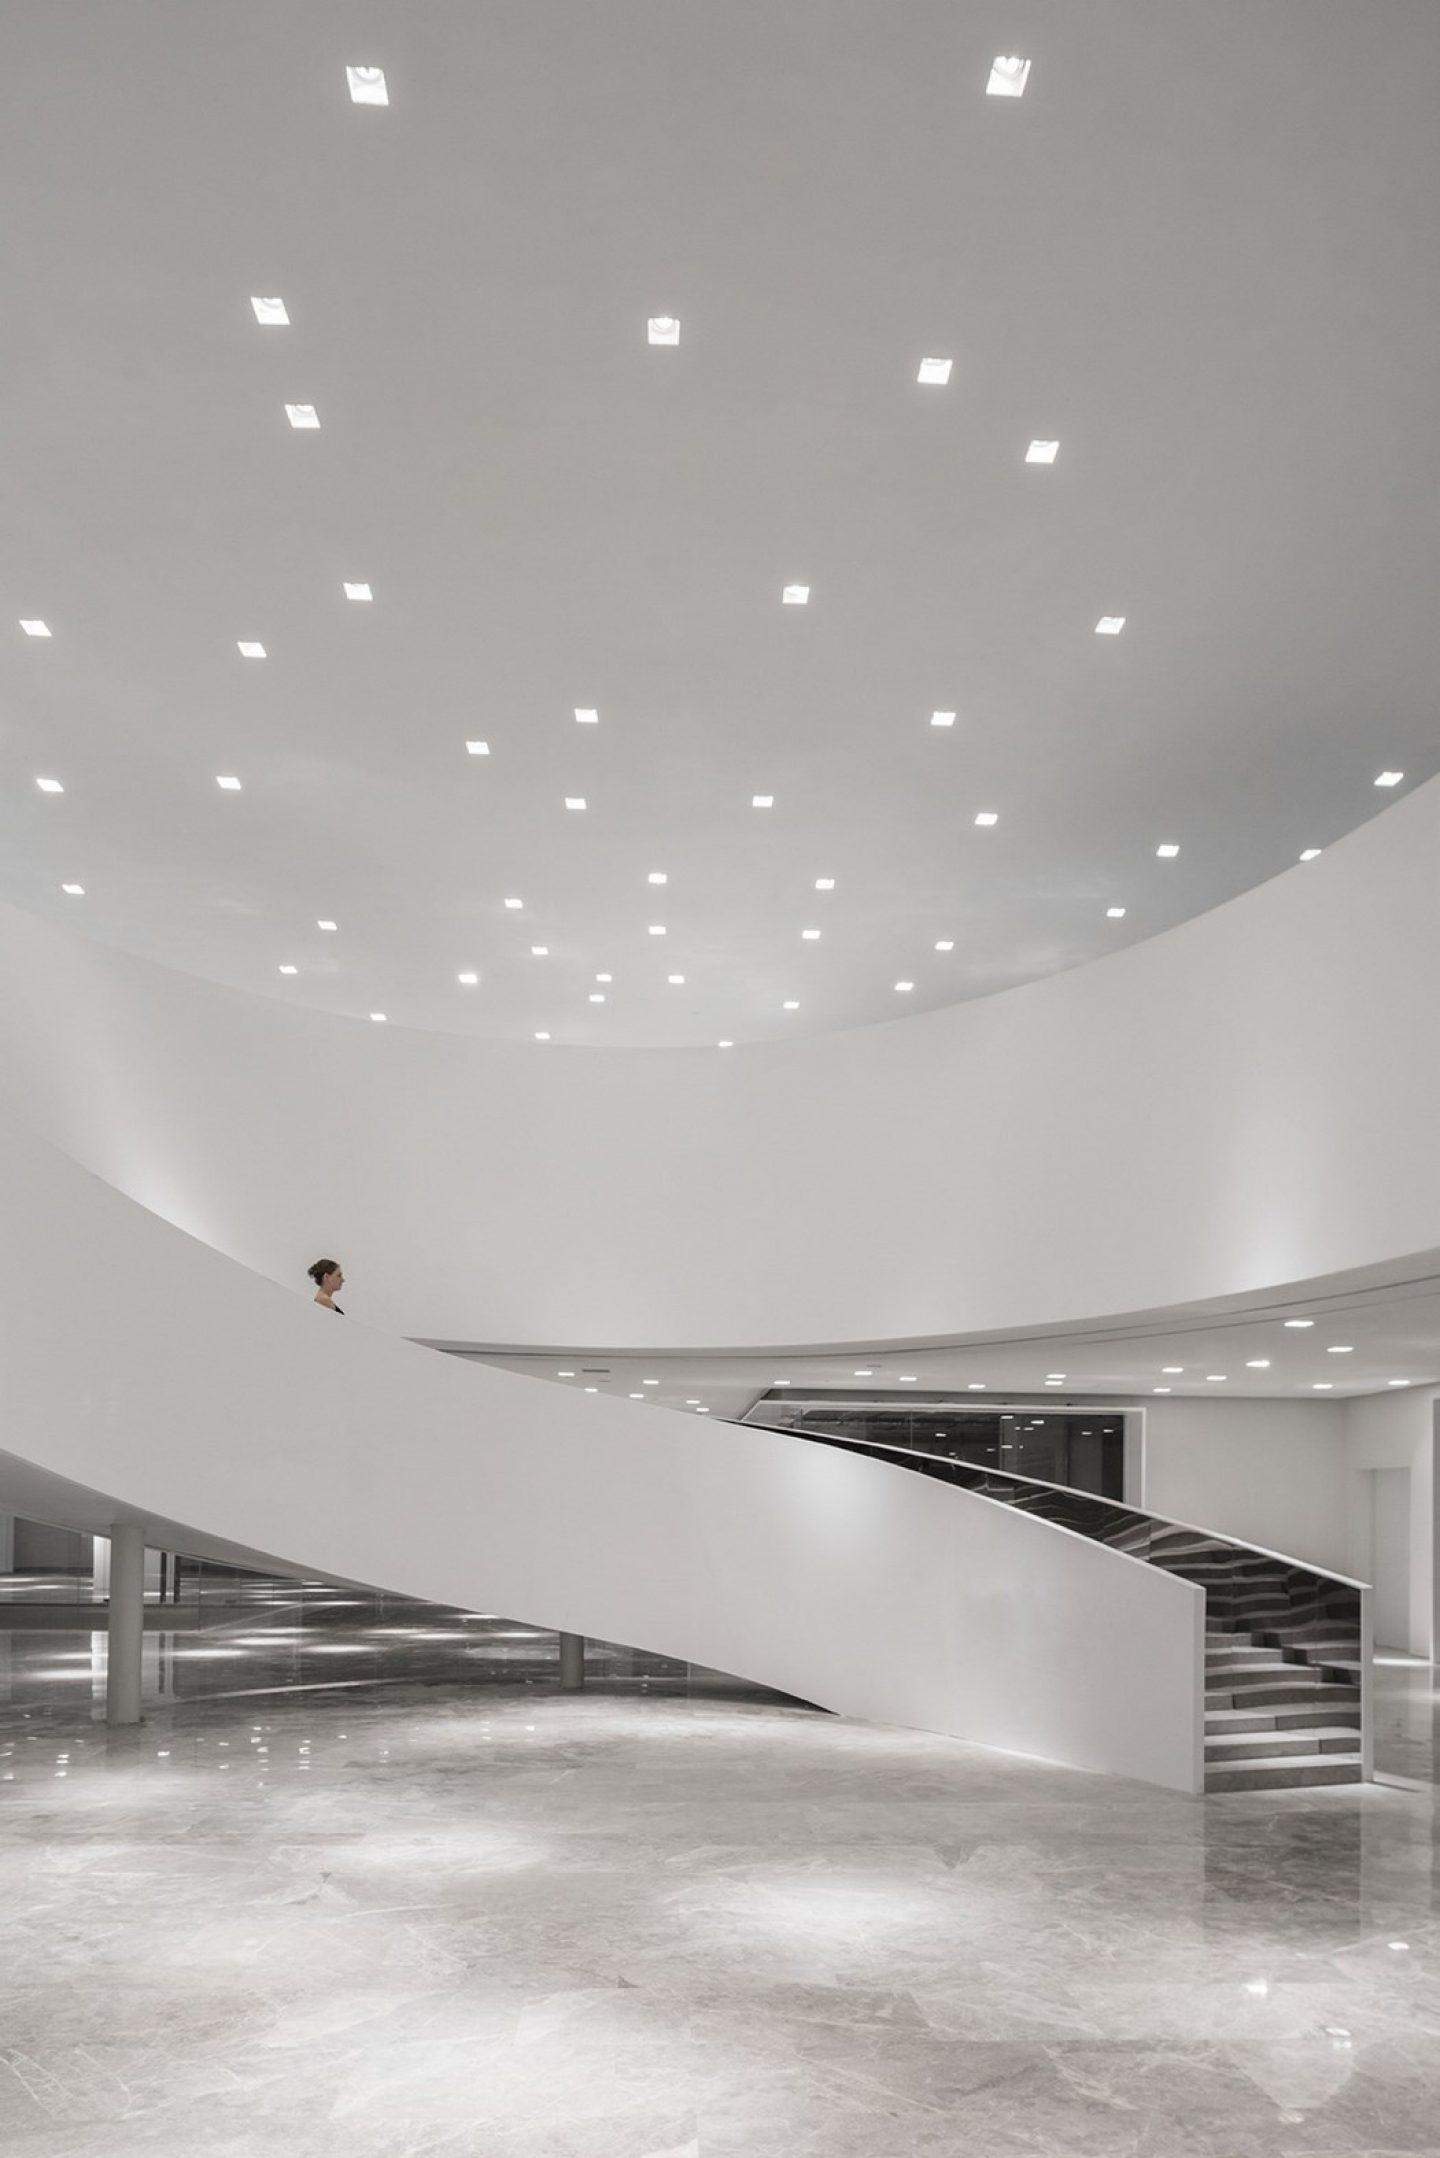 aim-architecture-15-kopiowanie-kopiowanie